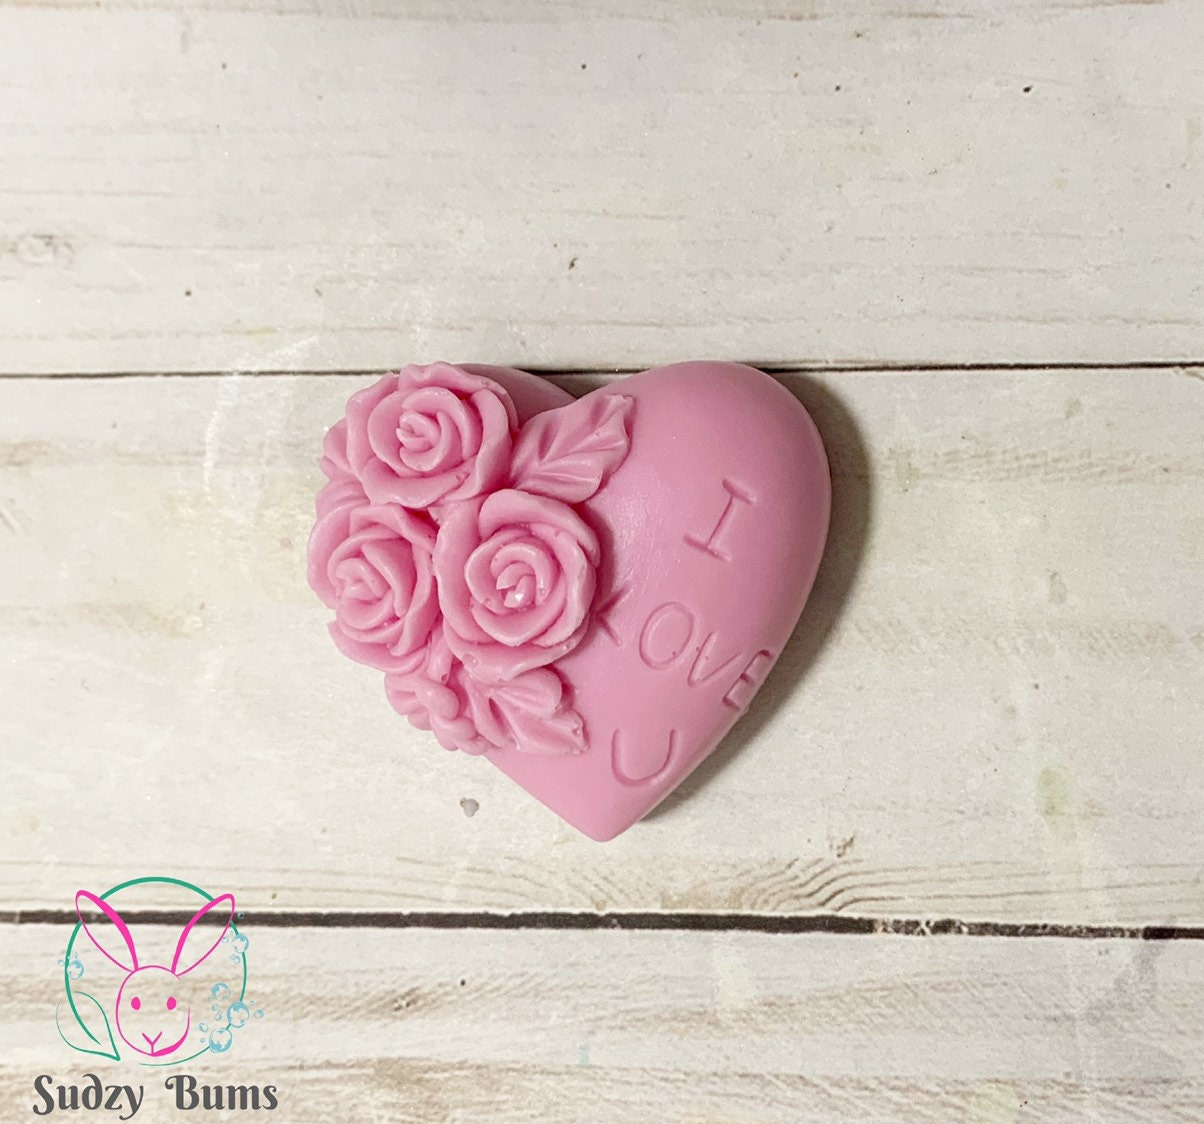 I Love You Heart Soap Favors